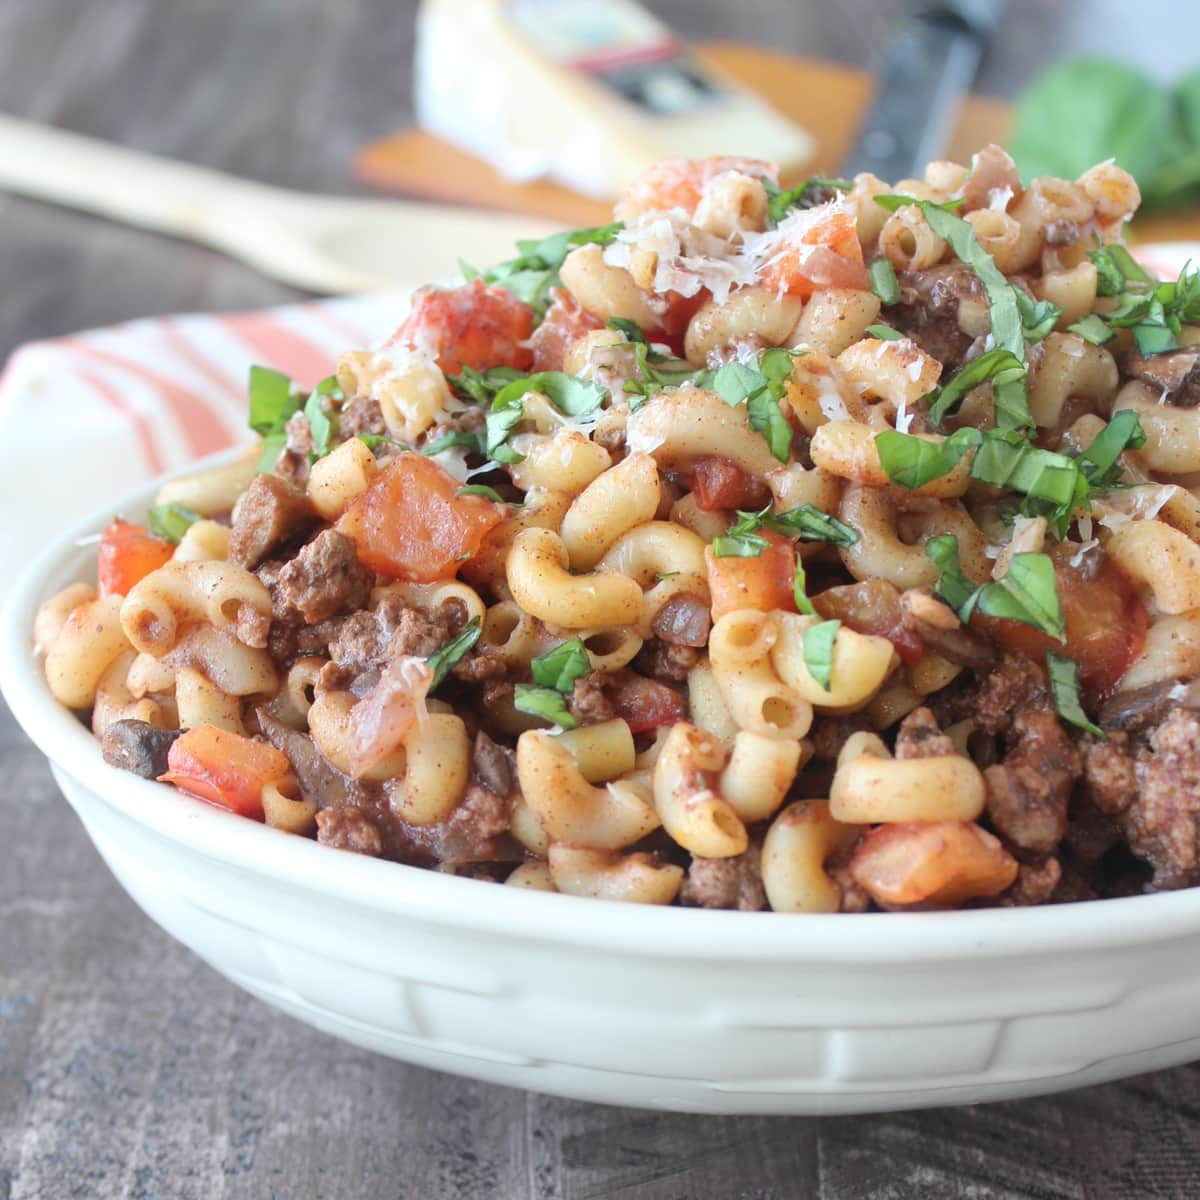 Ground Lamb Recipes: One Pot Mediterranean Lamb & Mushroom